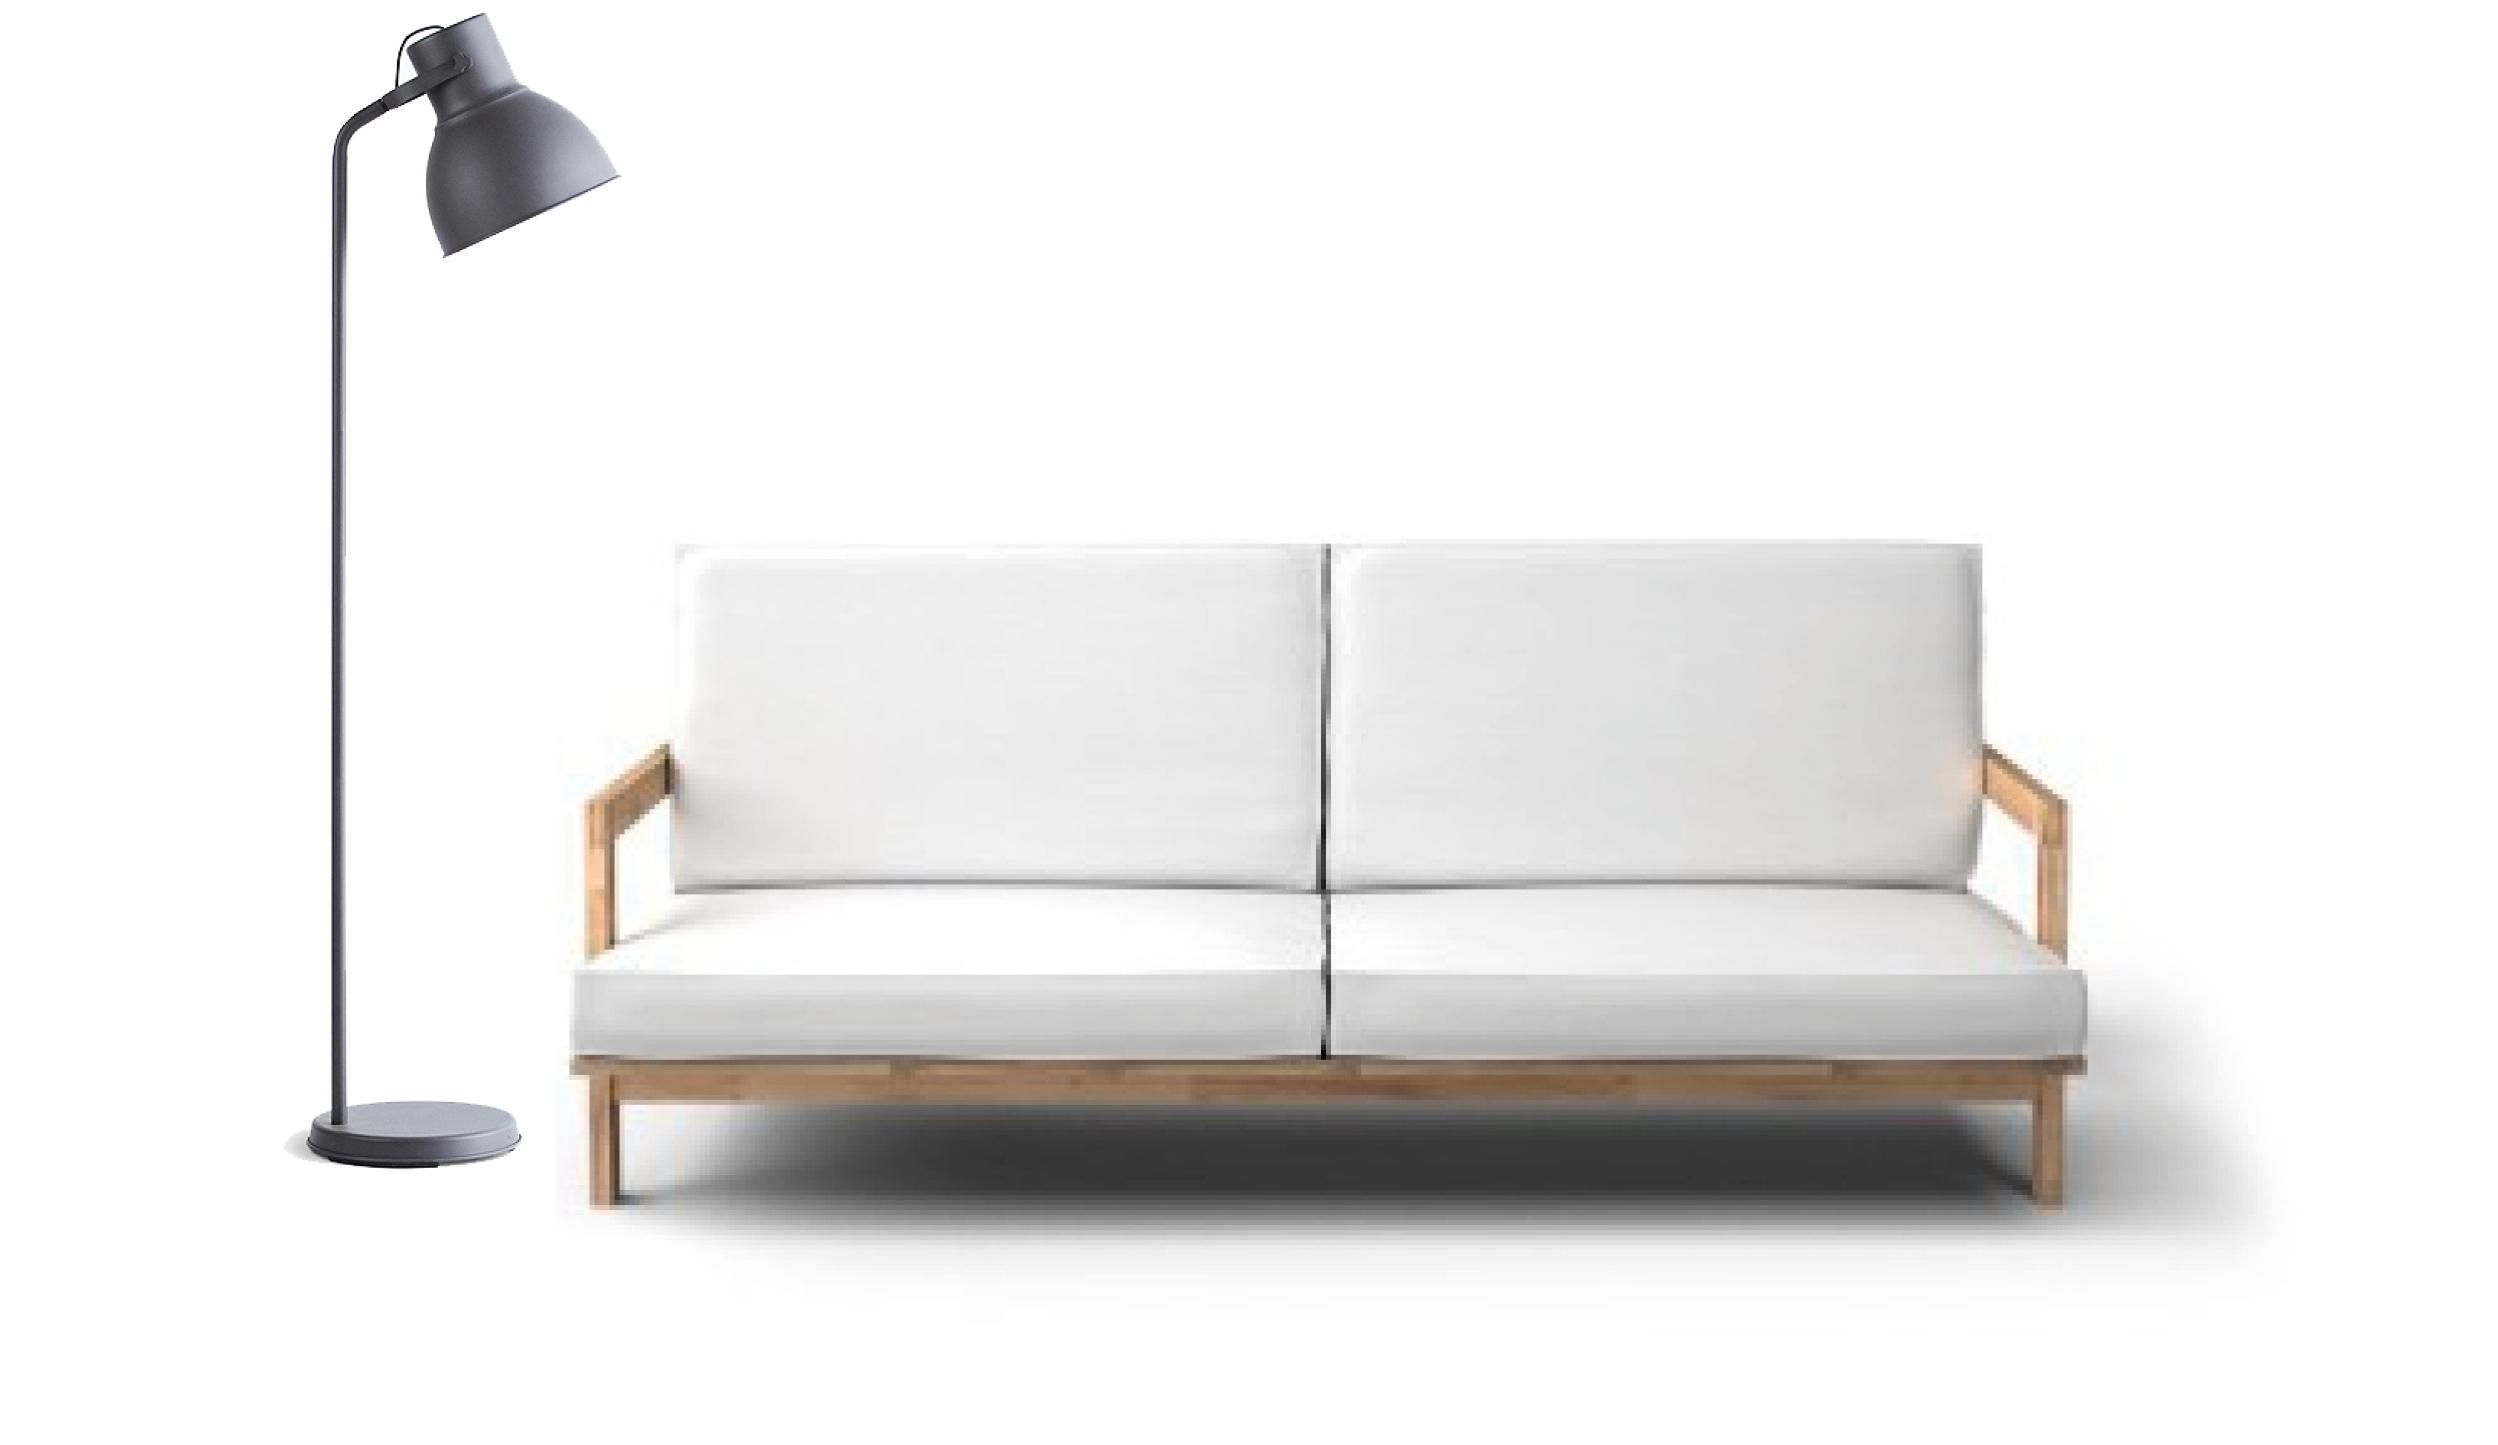 Ikea image.jpg